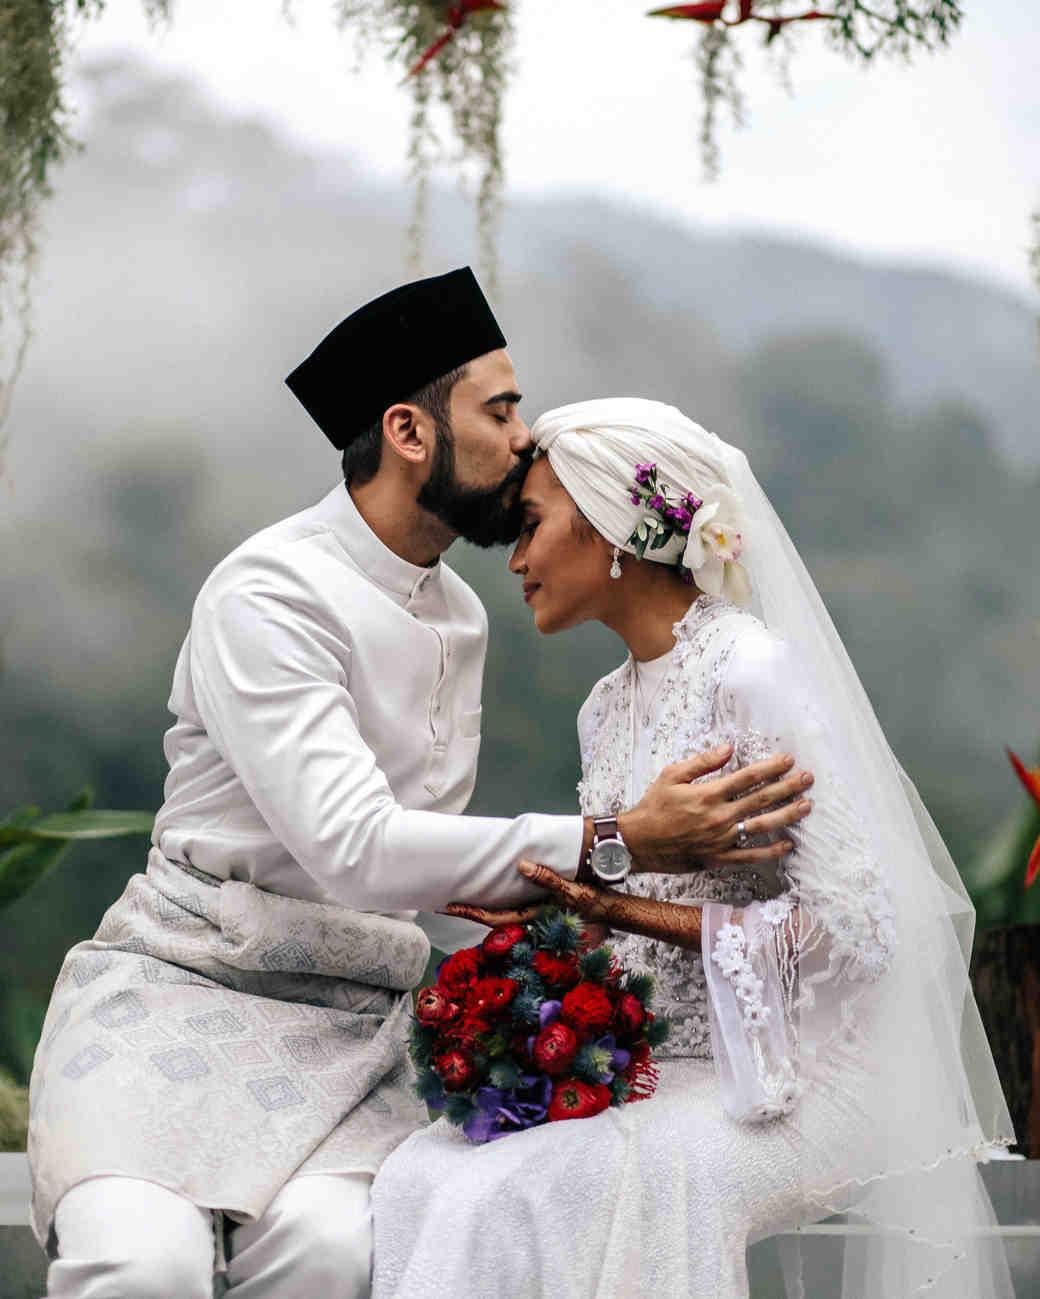 worldly wedding dresses weddings by qay